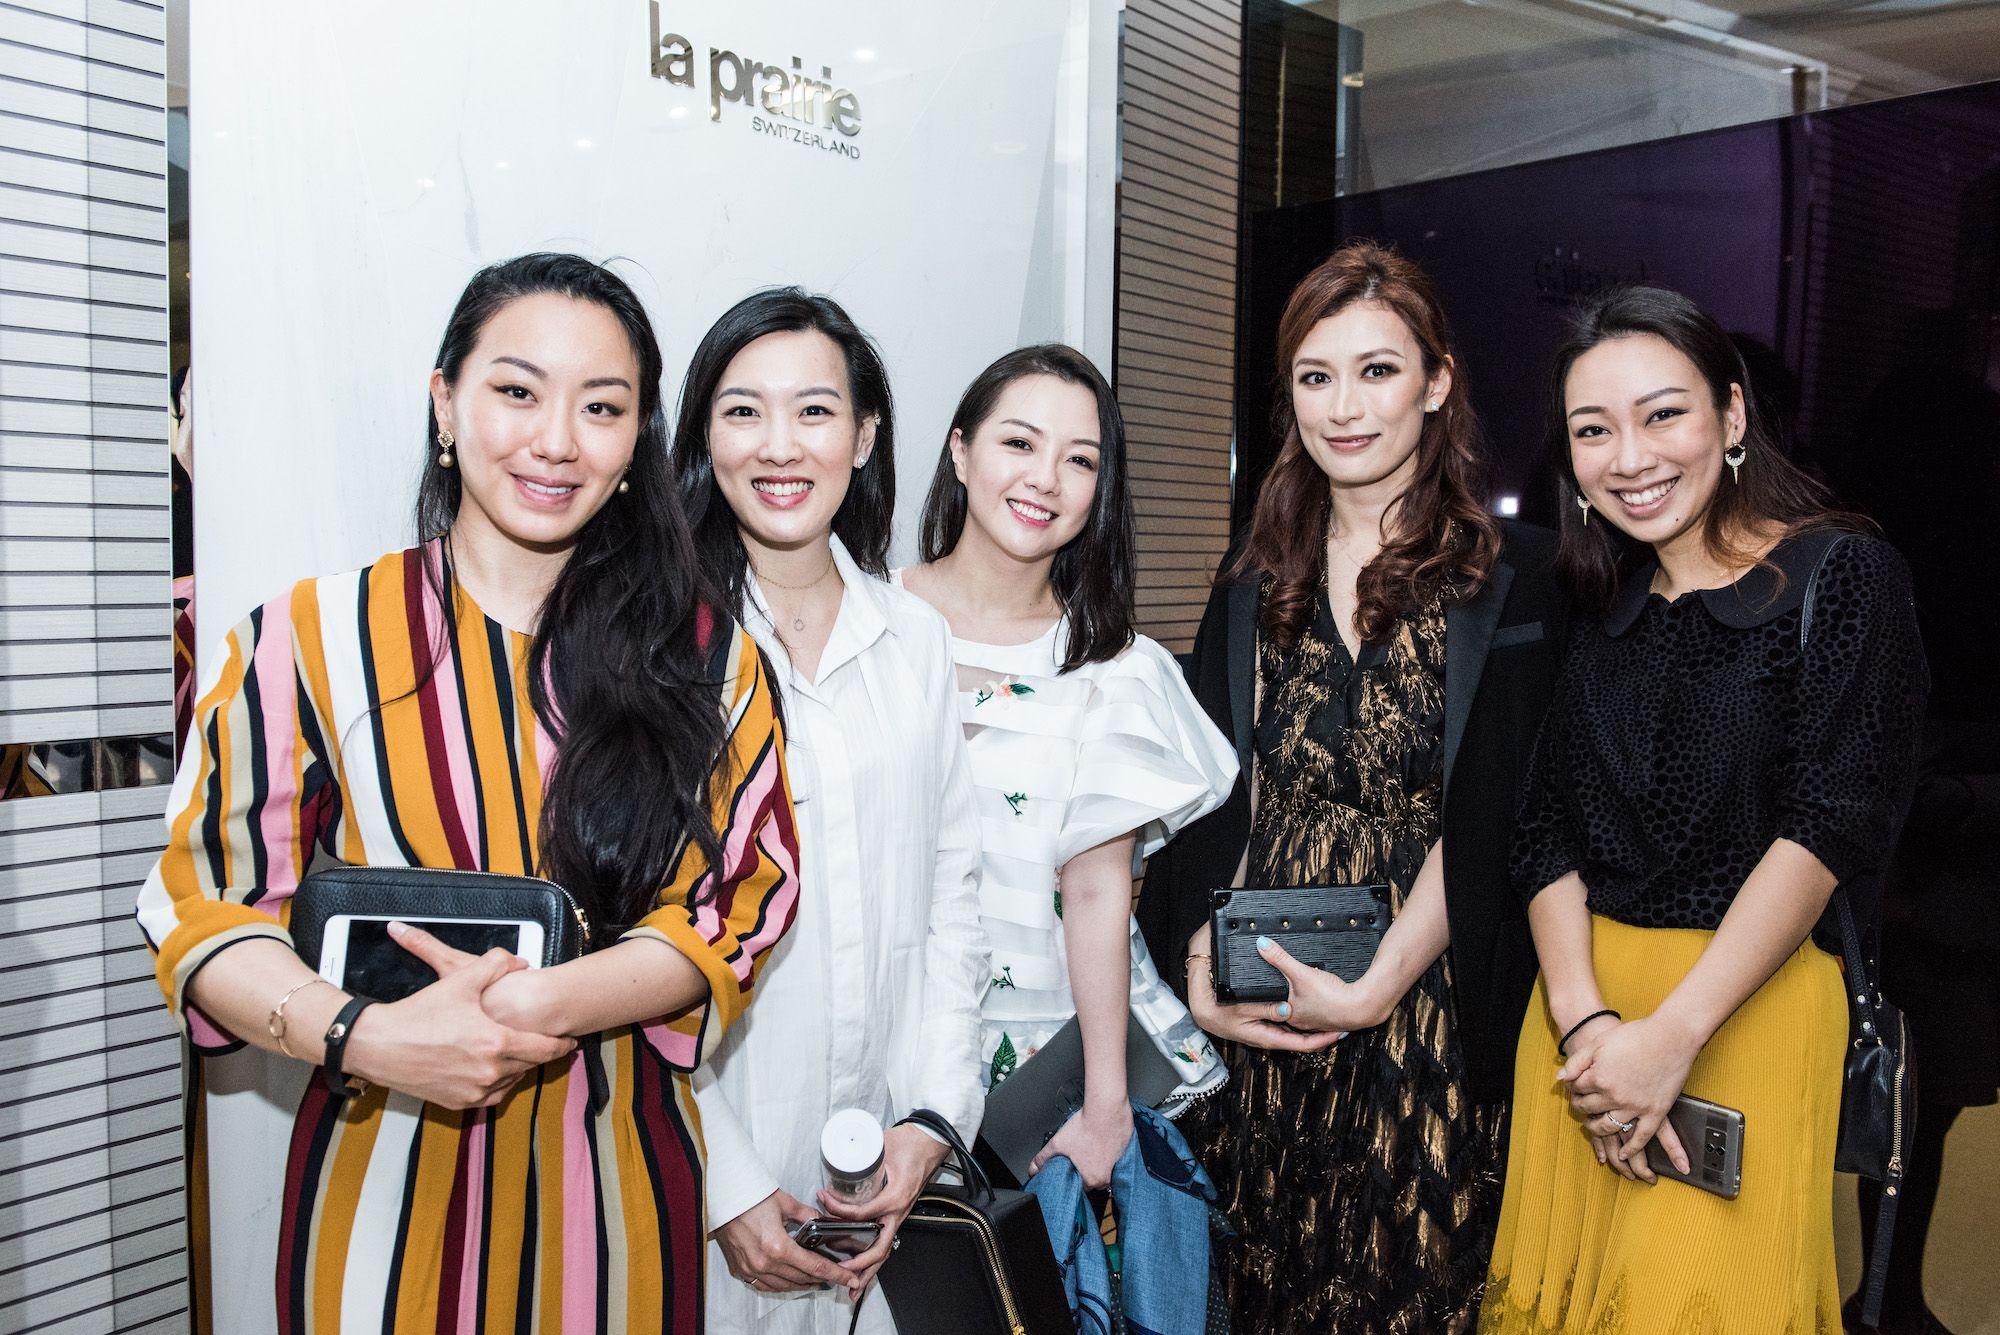 Ruth Chao, Joyce Tam, Tammy Wu, Colleen Fung, Veronica Lam